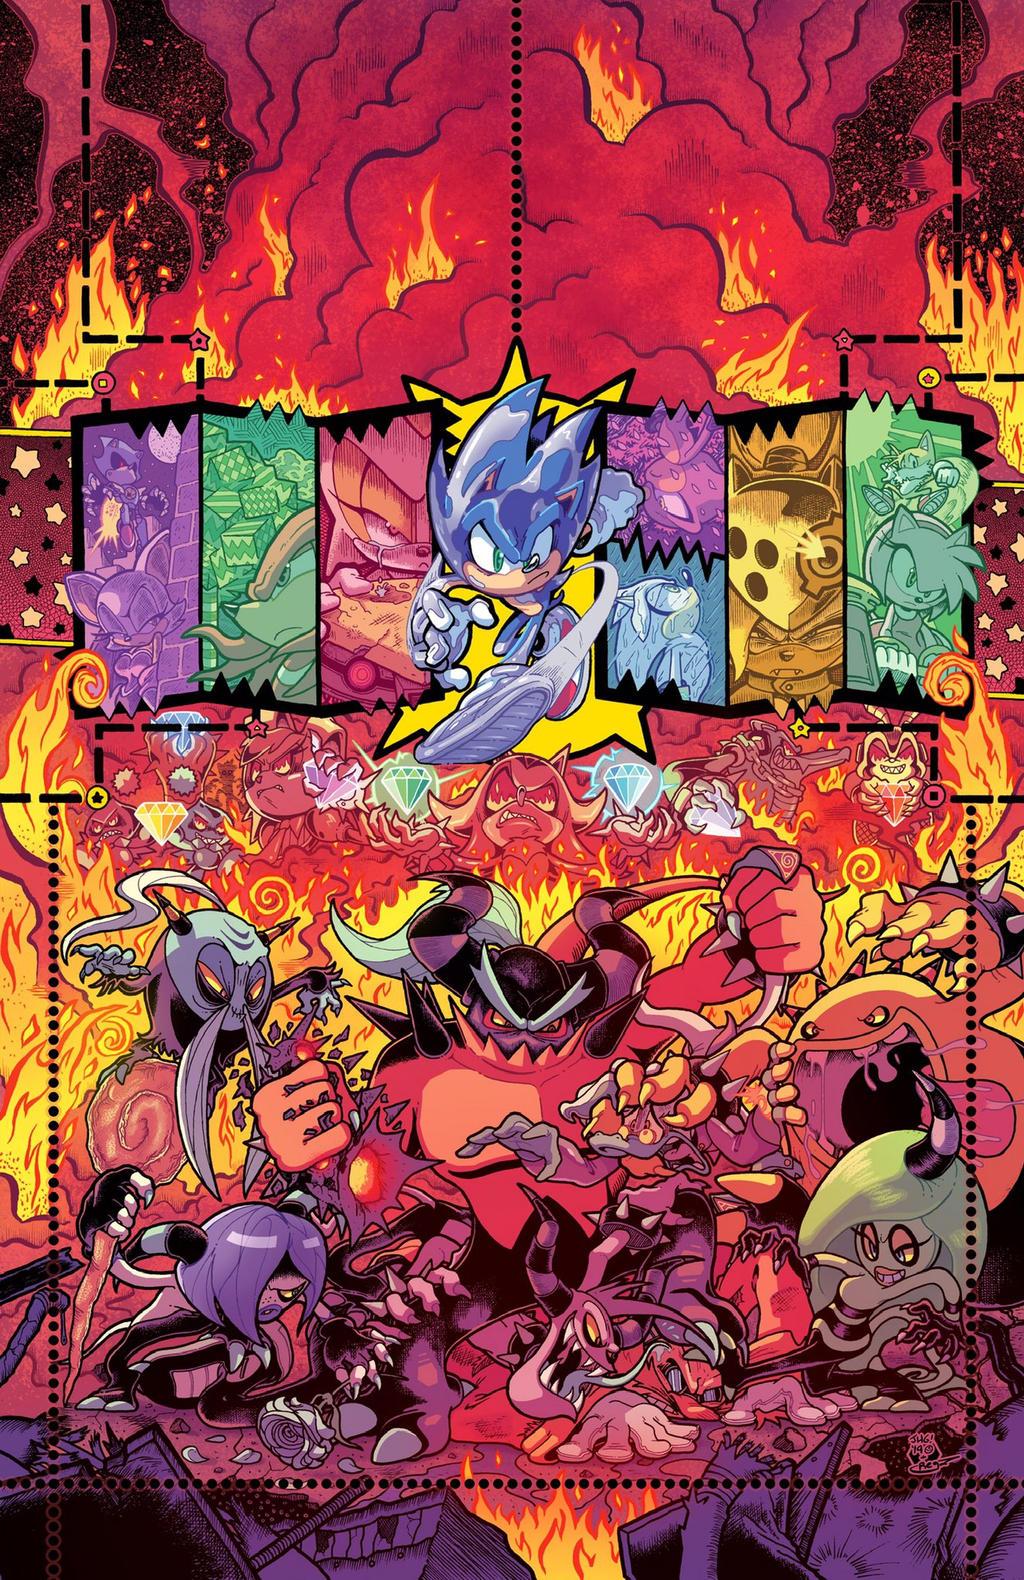 Sonic The Hedgehog 25 Idw Publishing Cover Ri B By Ideafan128 On Deviantart